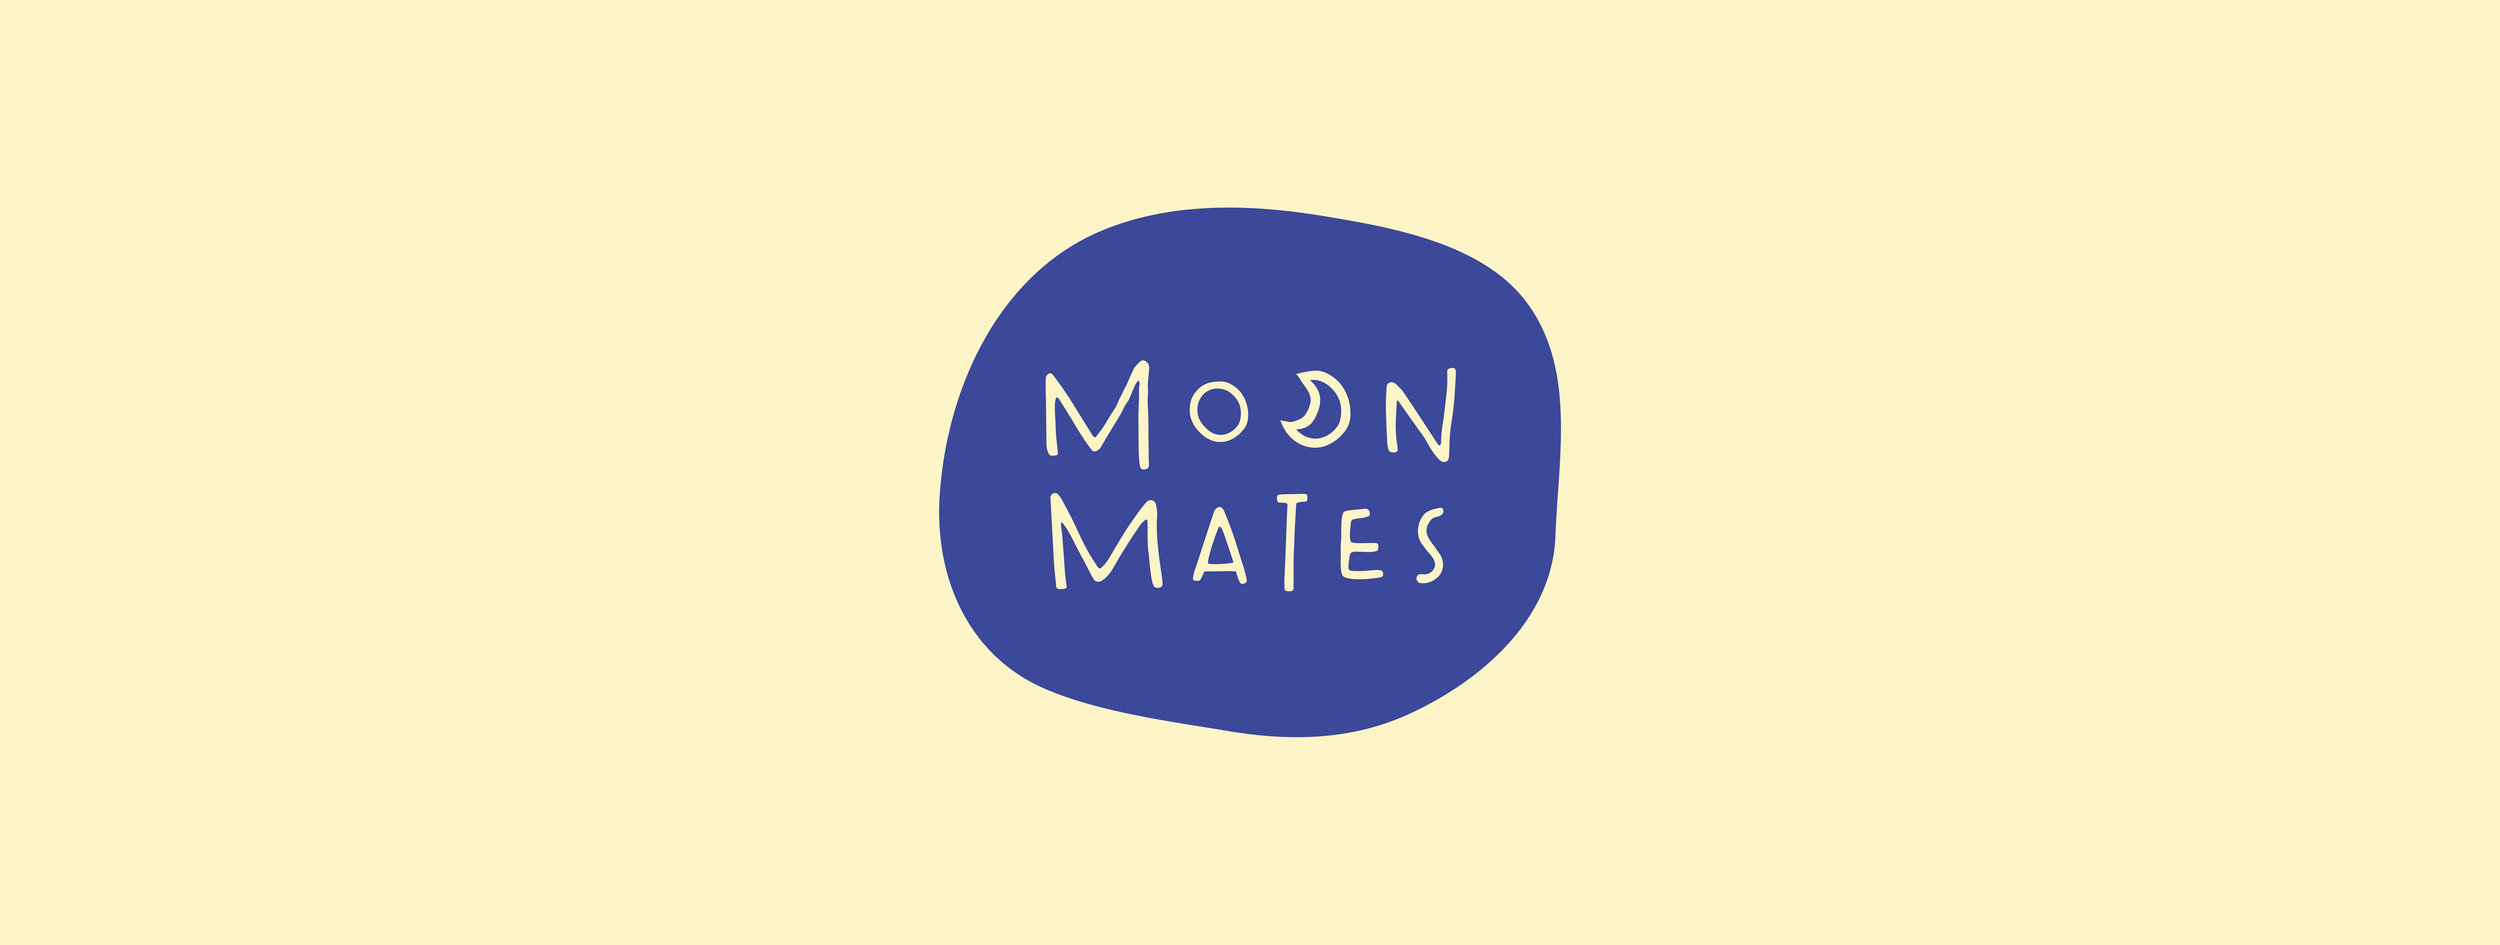 moonmateslogo.jpg